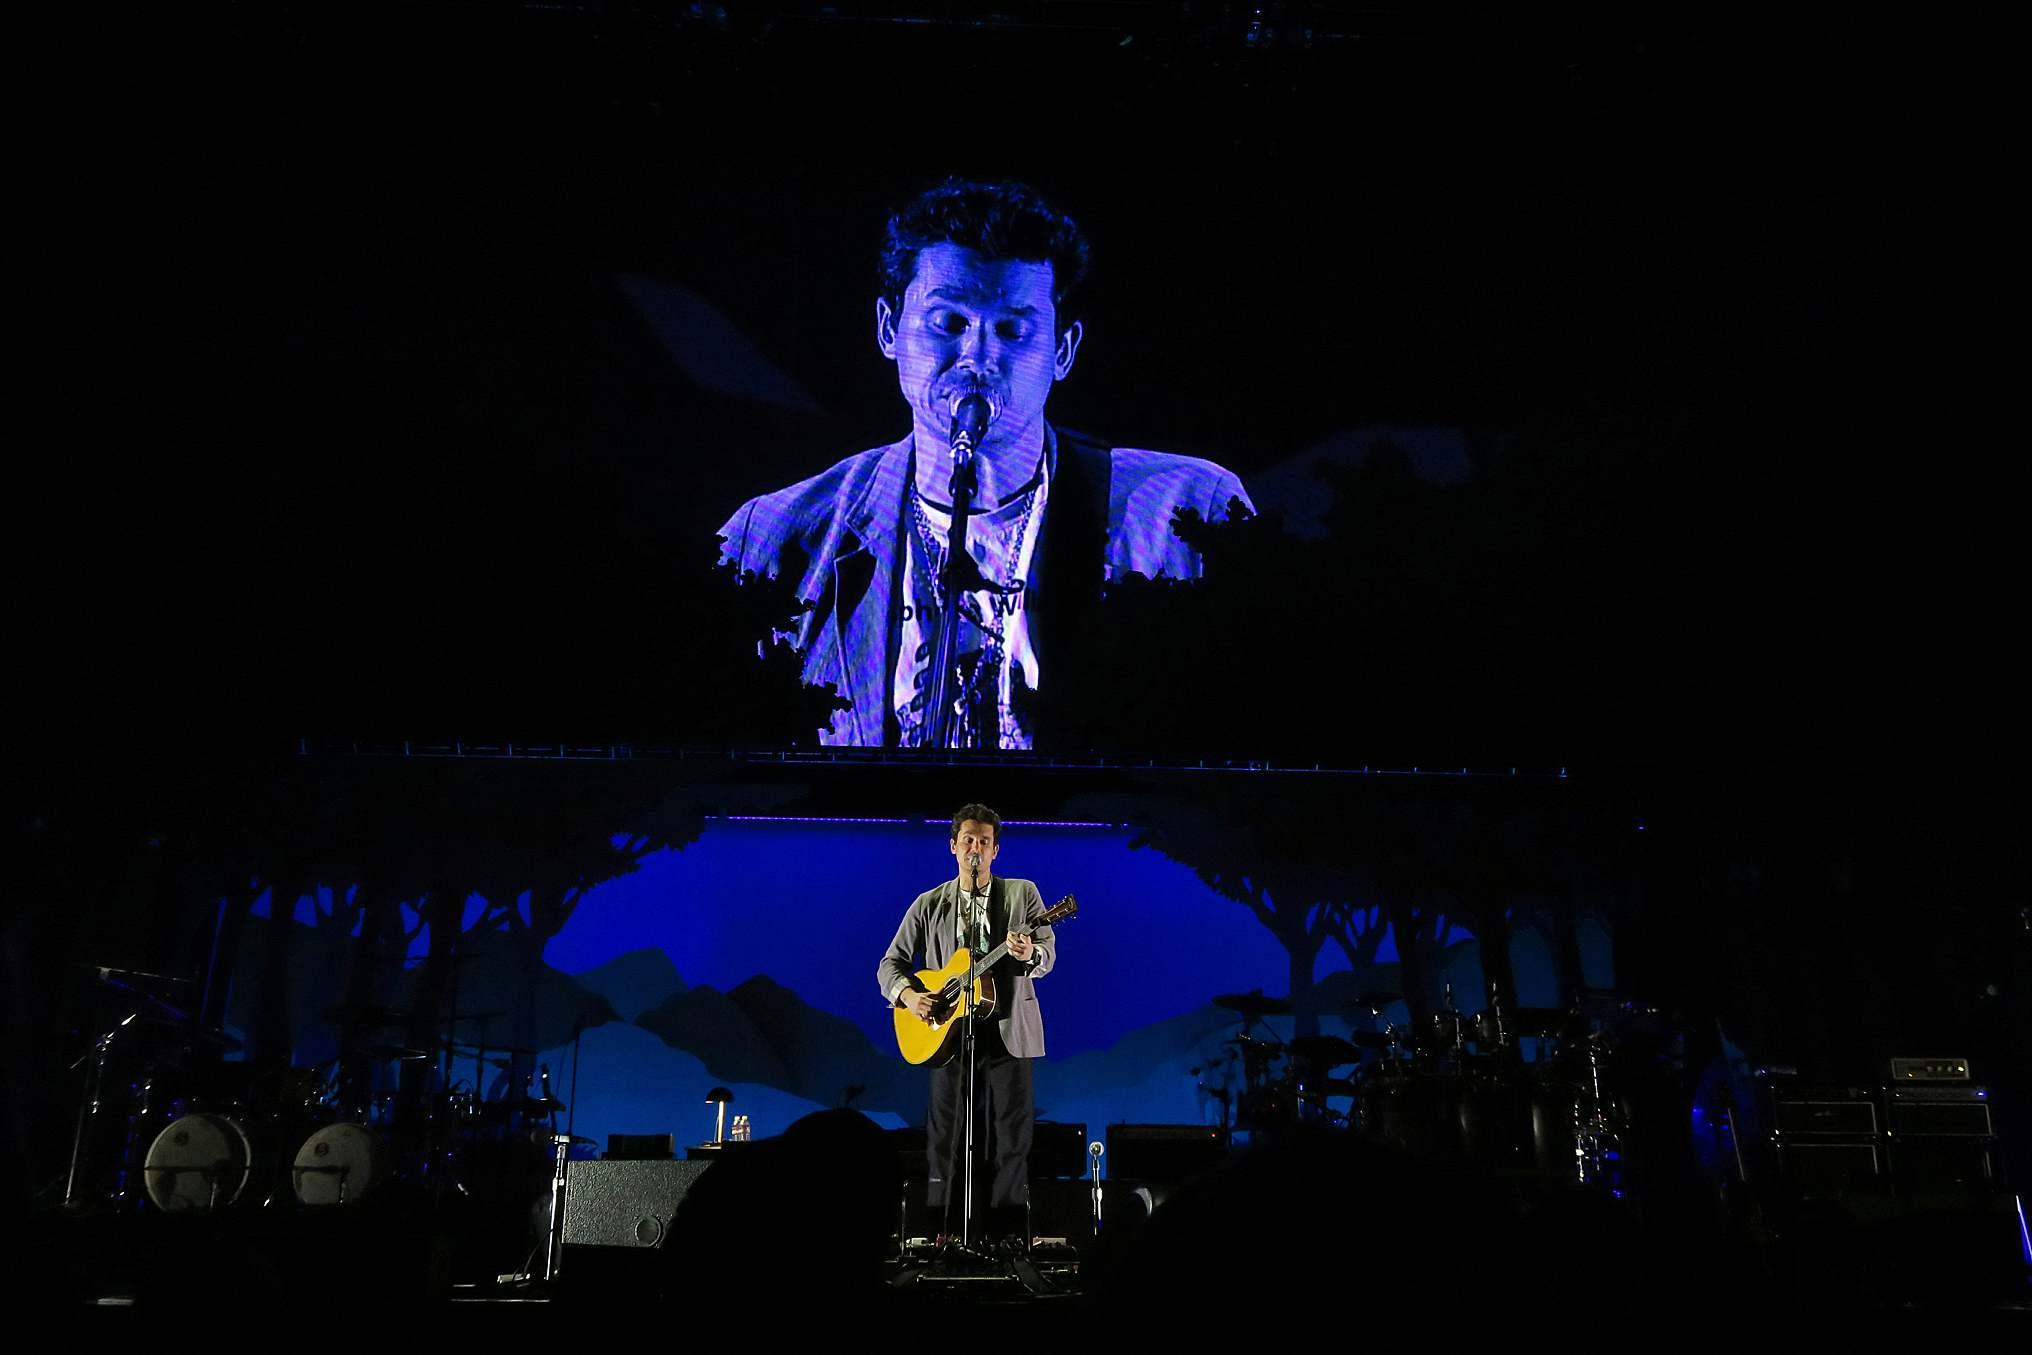 John Mayer phoenix 2019